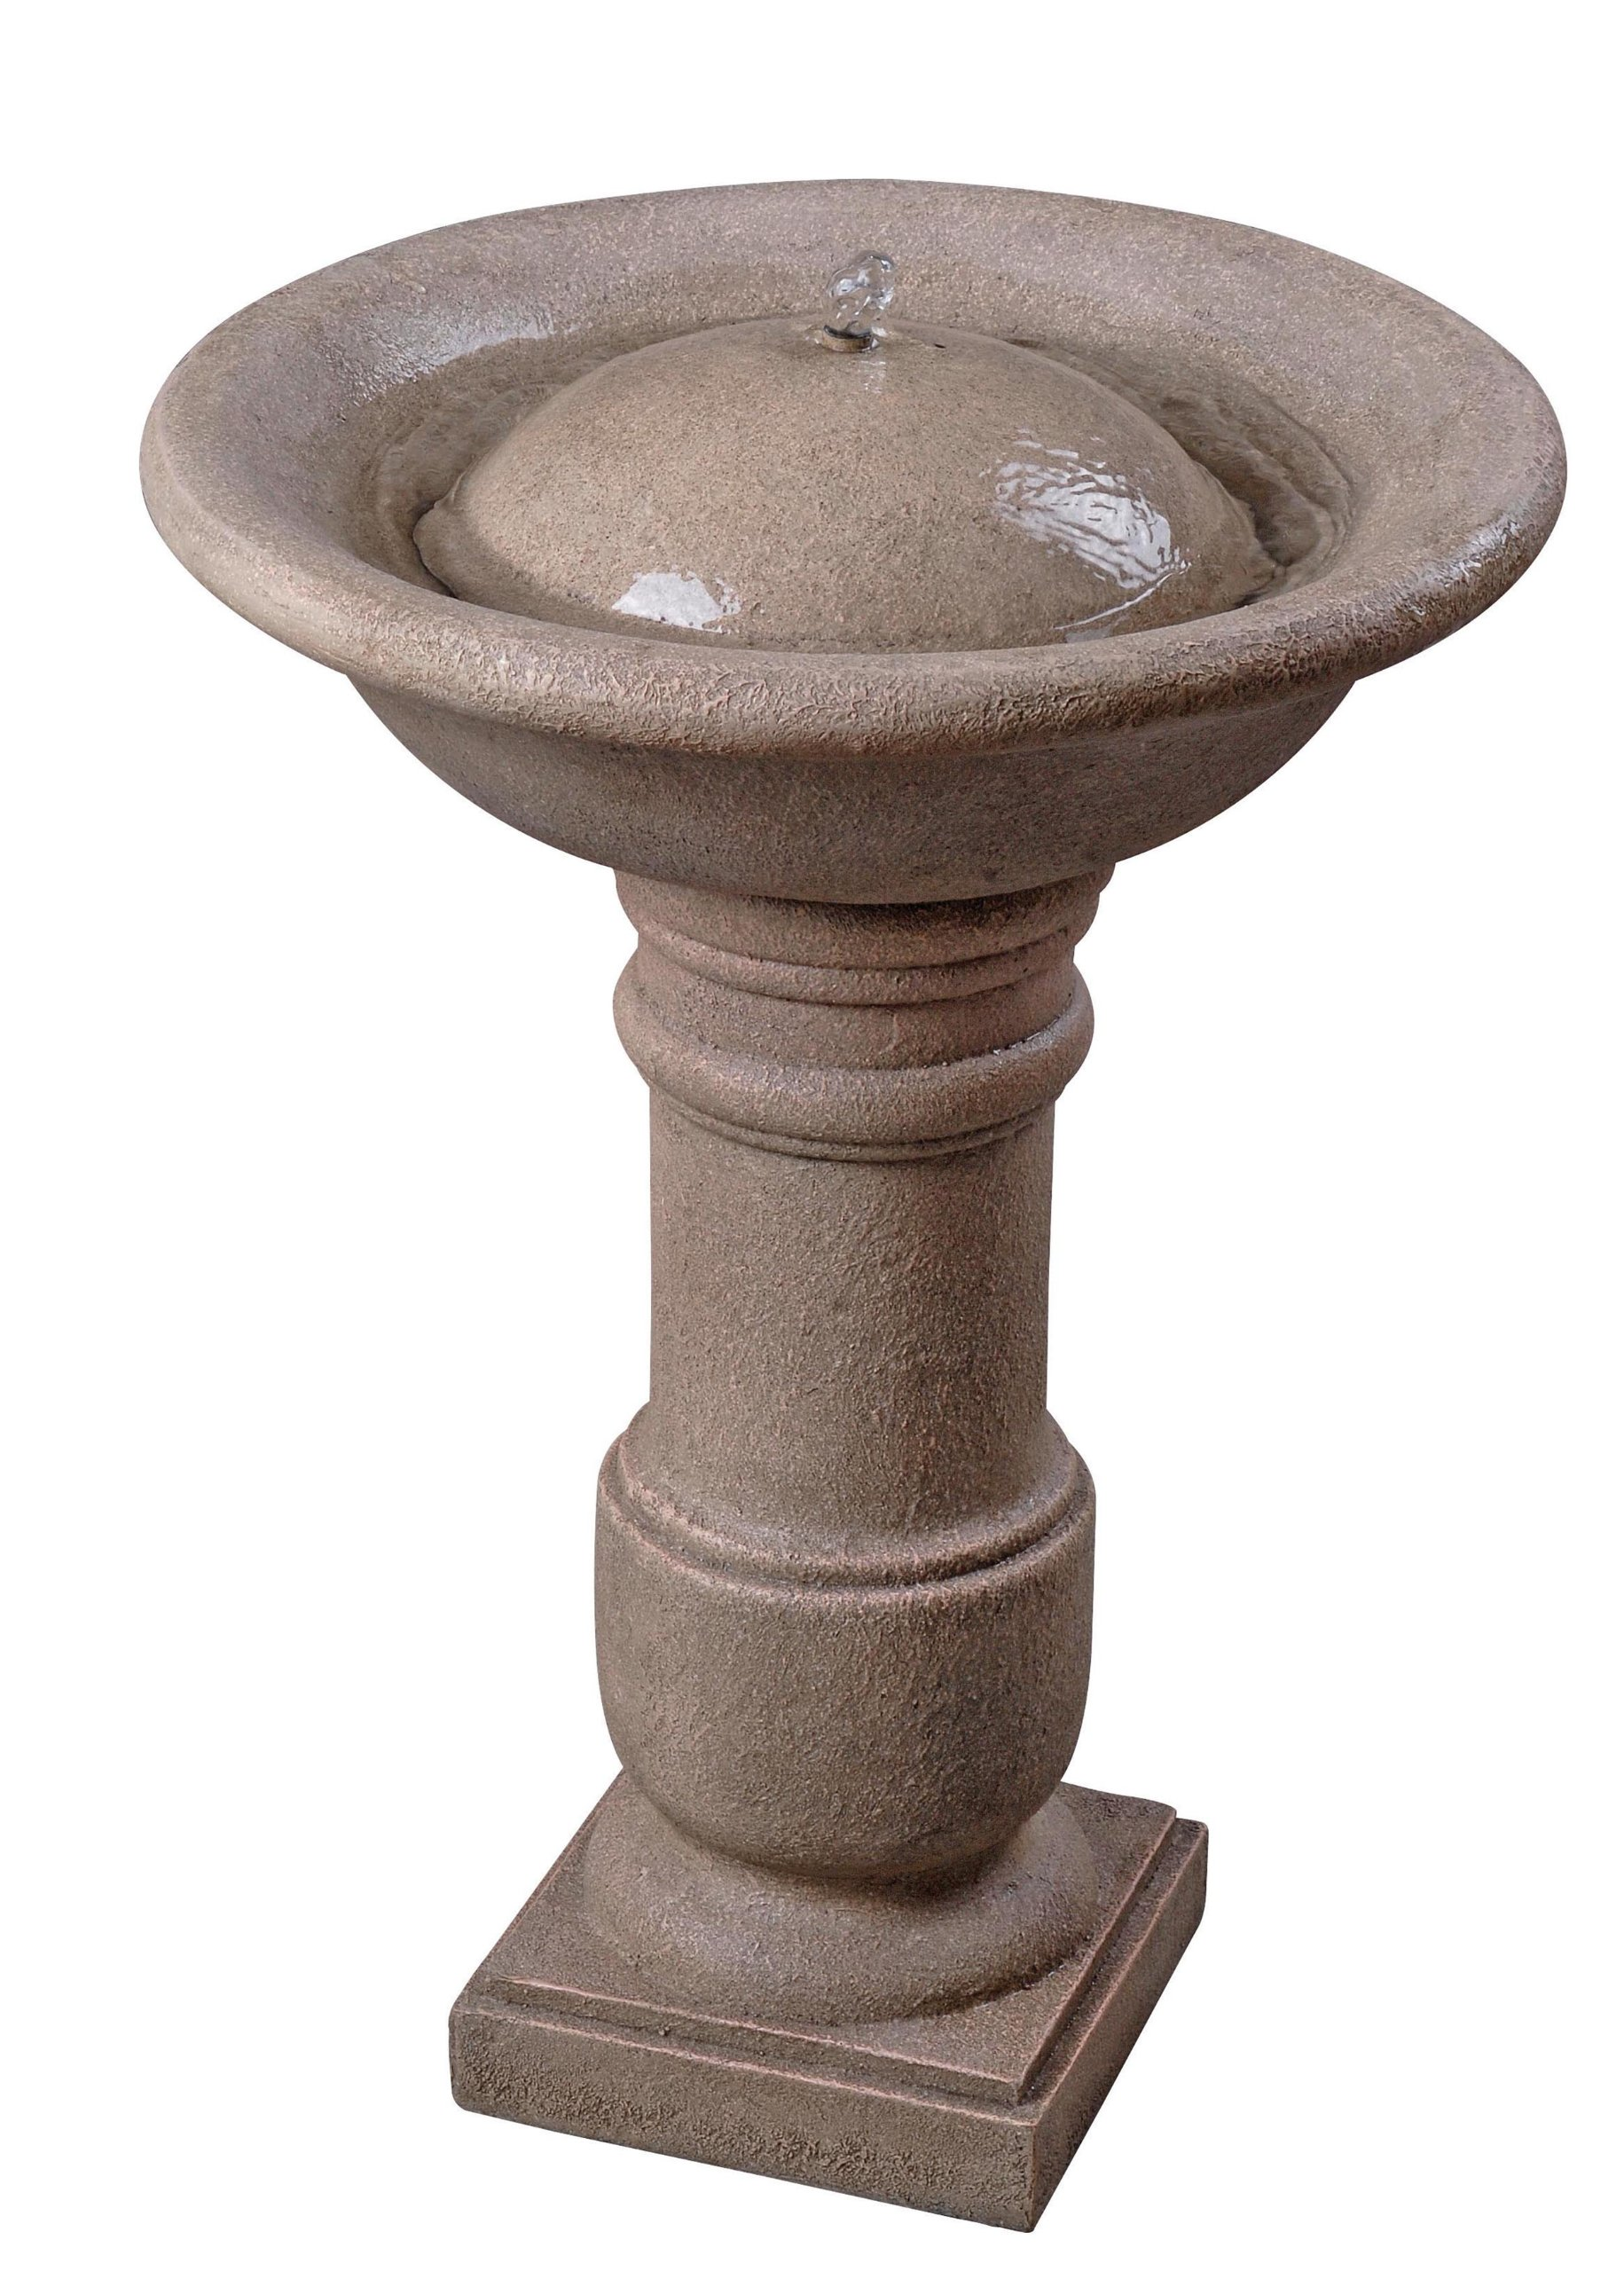 Kenroy Home 50019COQN Apollo Birdbath Fountain, Coquina Finish